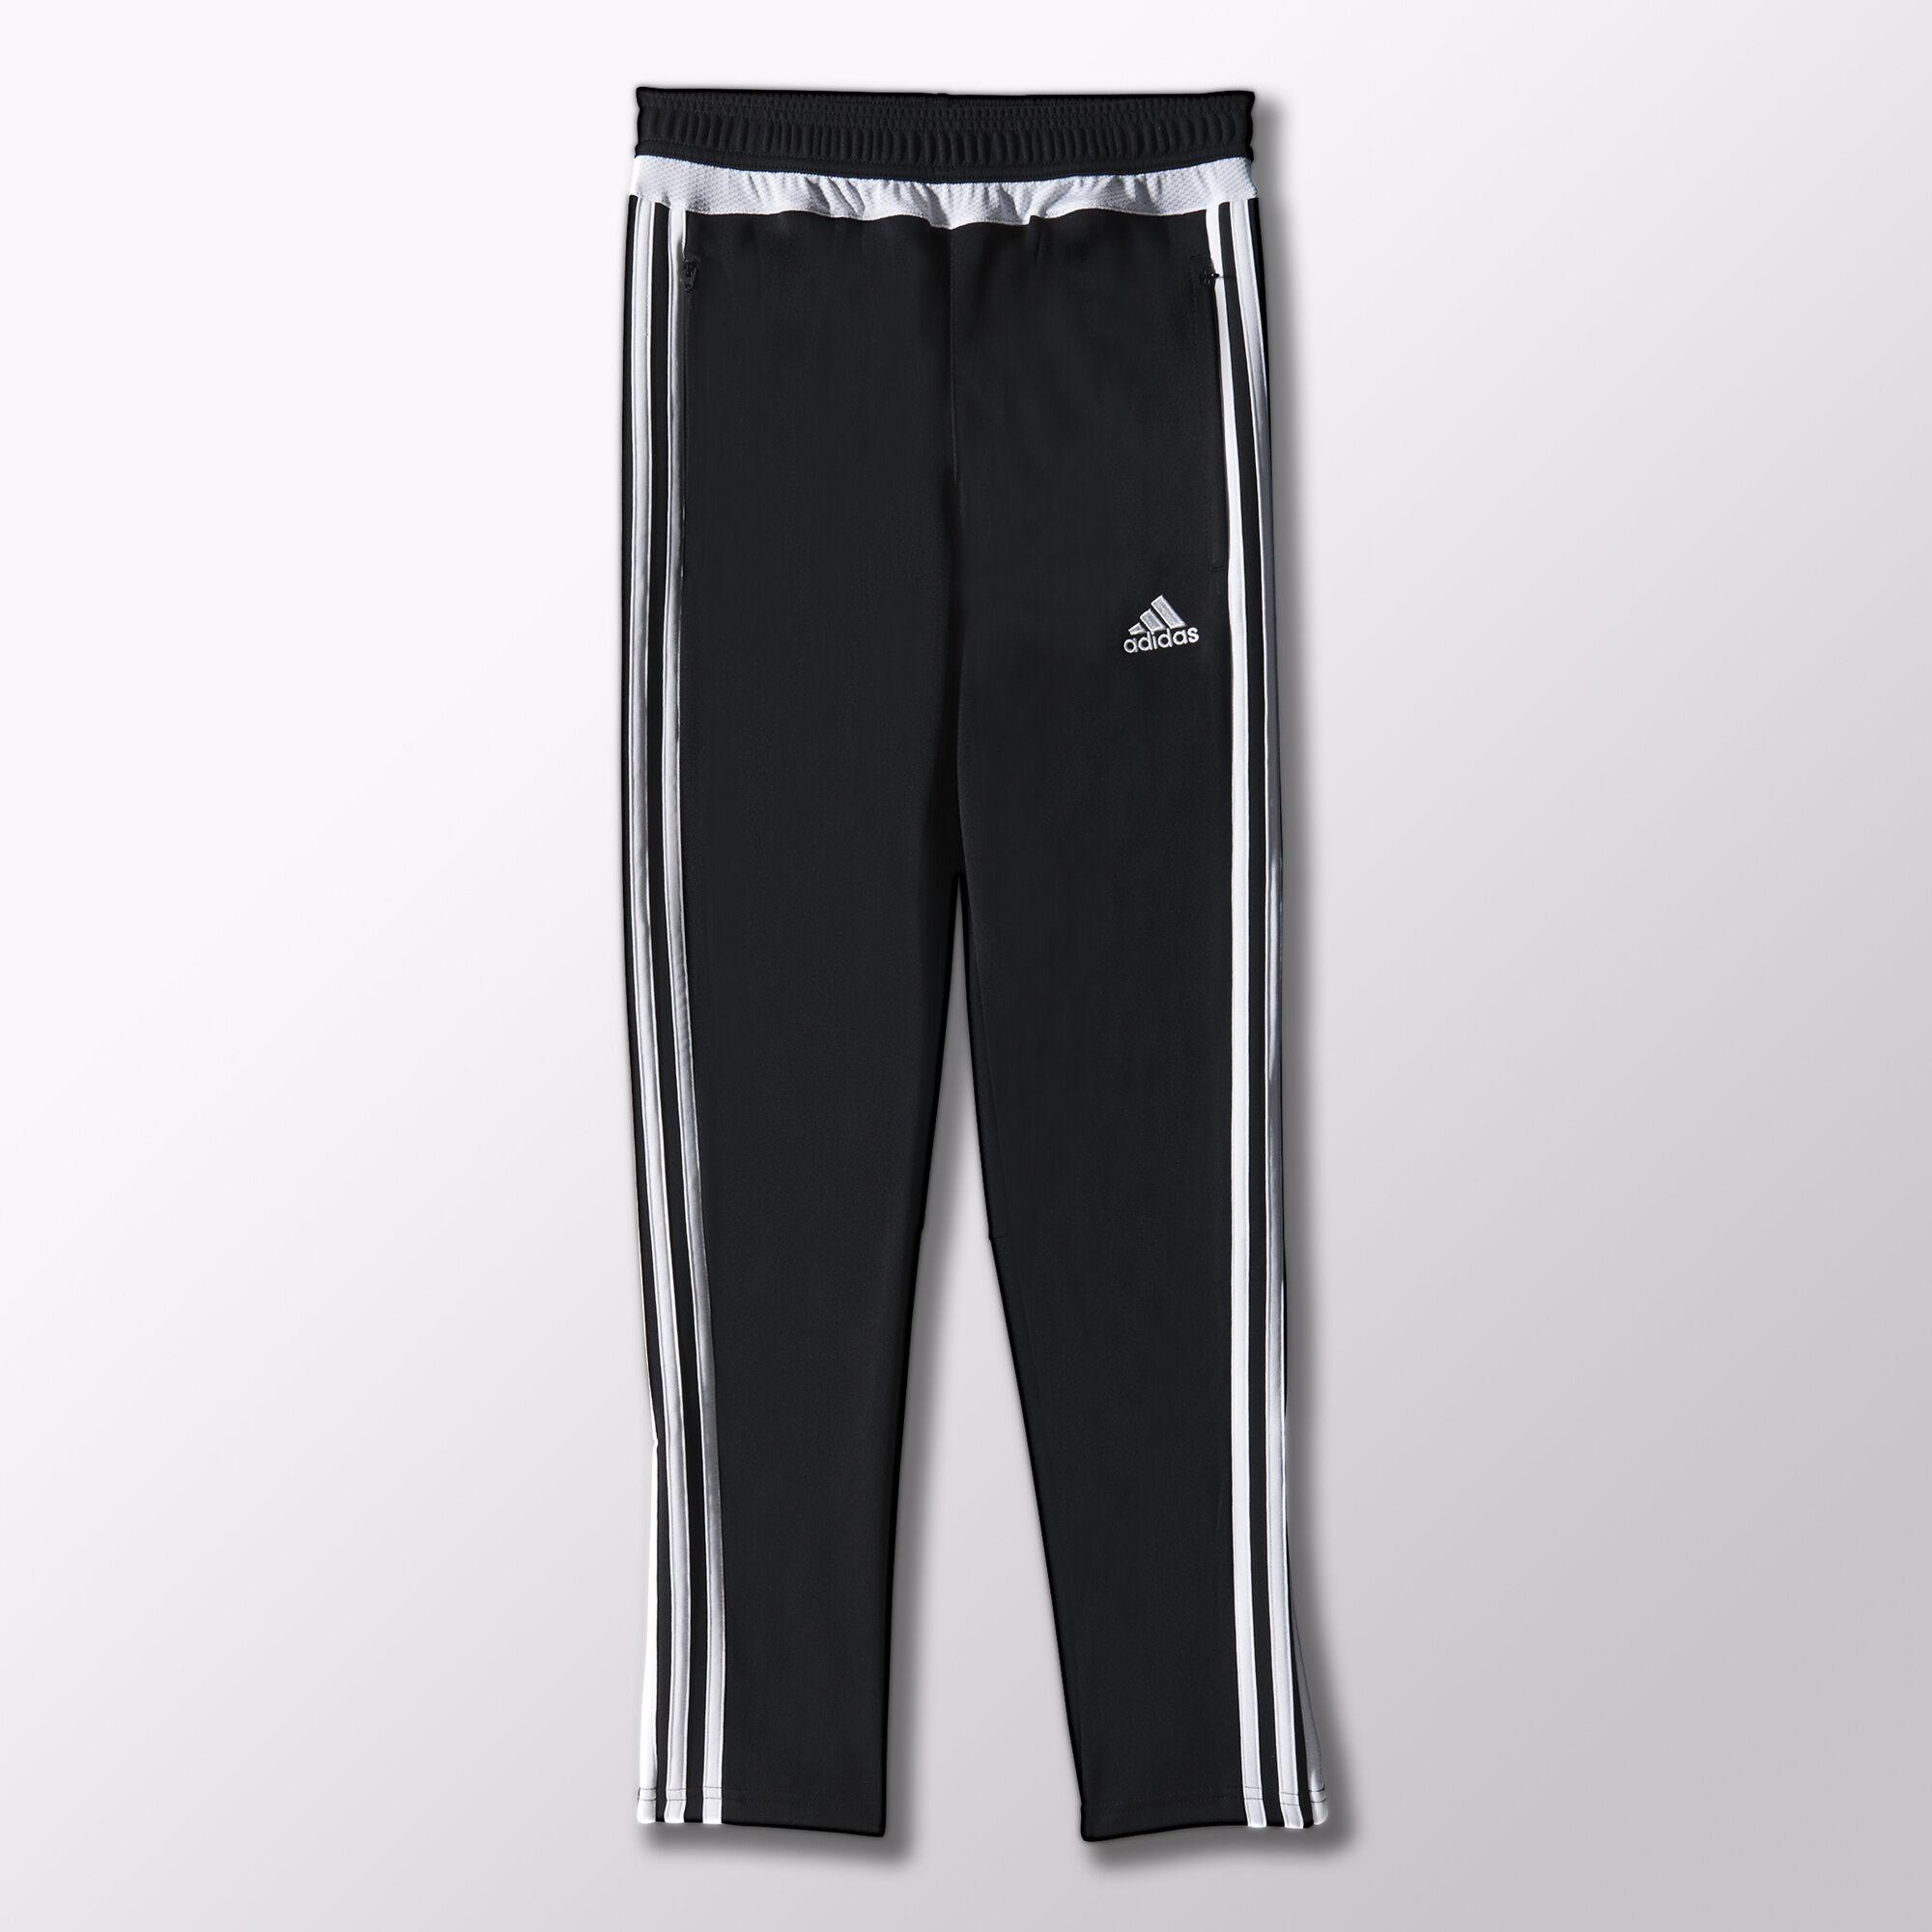 Tiro 10 Training Pants